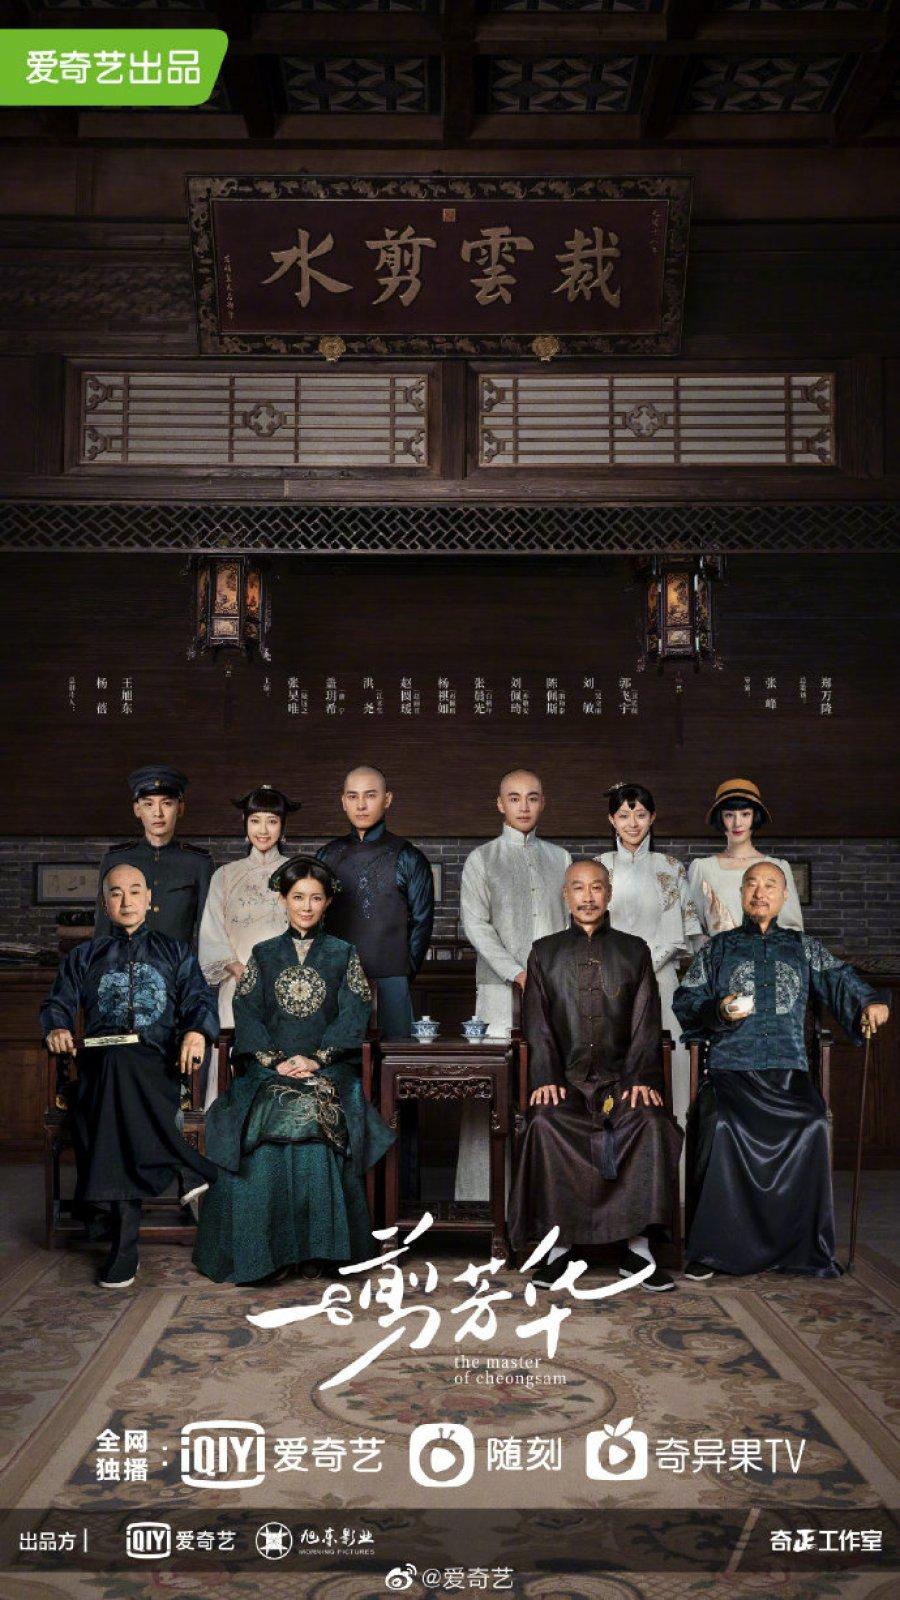 the-master-of-cheongsam-ซับไทย-ep-1-40